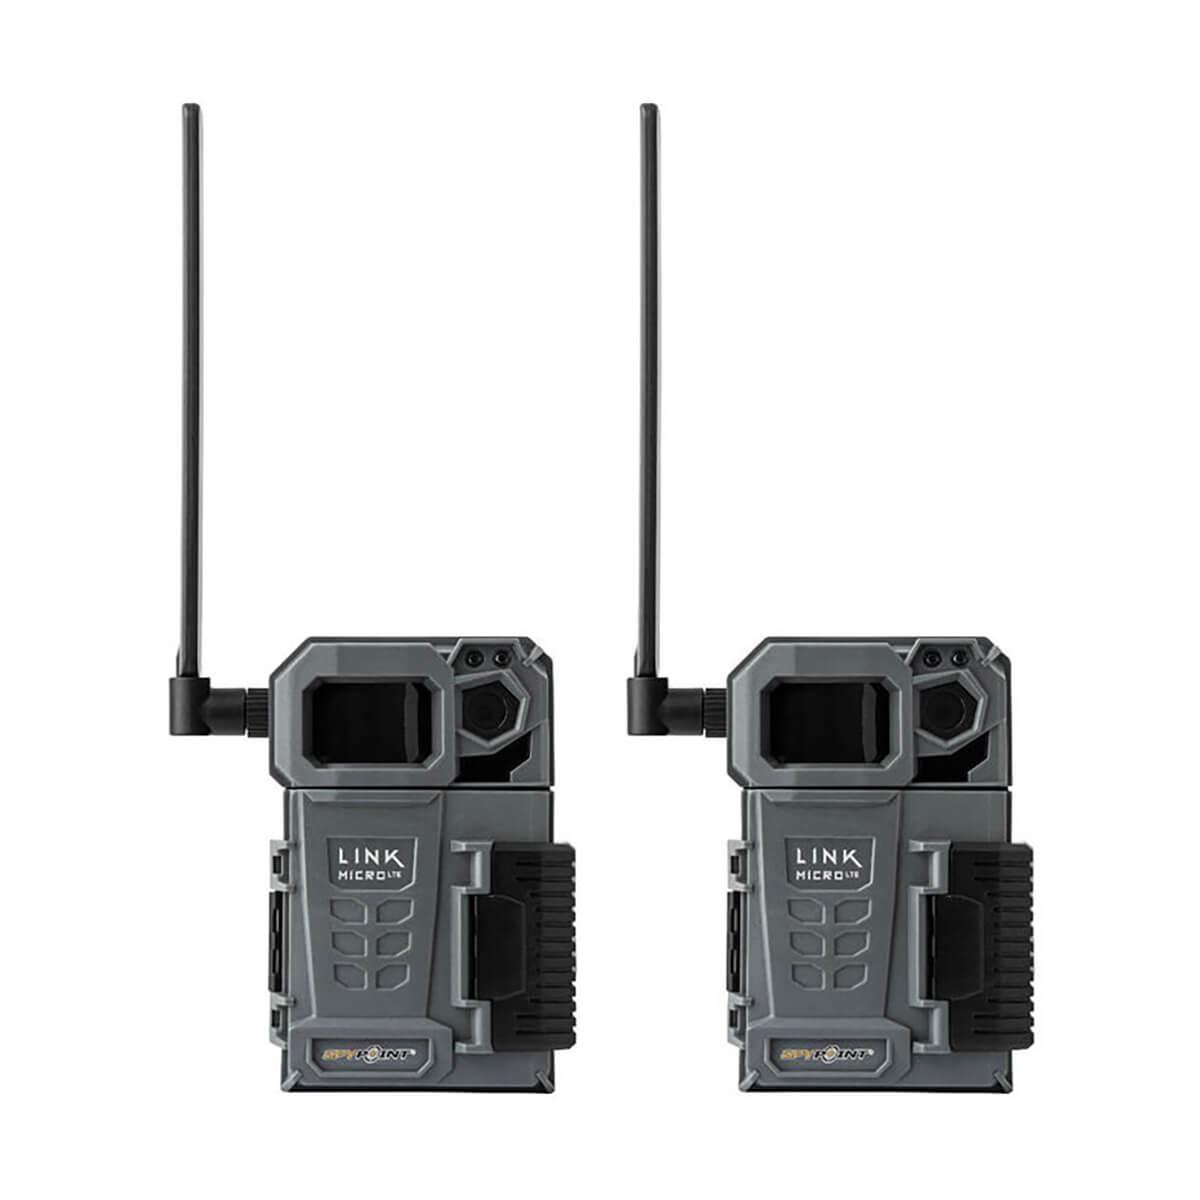 Link-Micro-Lte-Twin Cellular Trail Camera